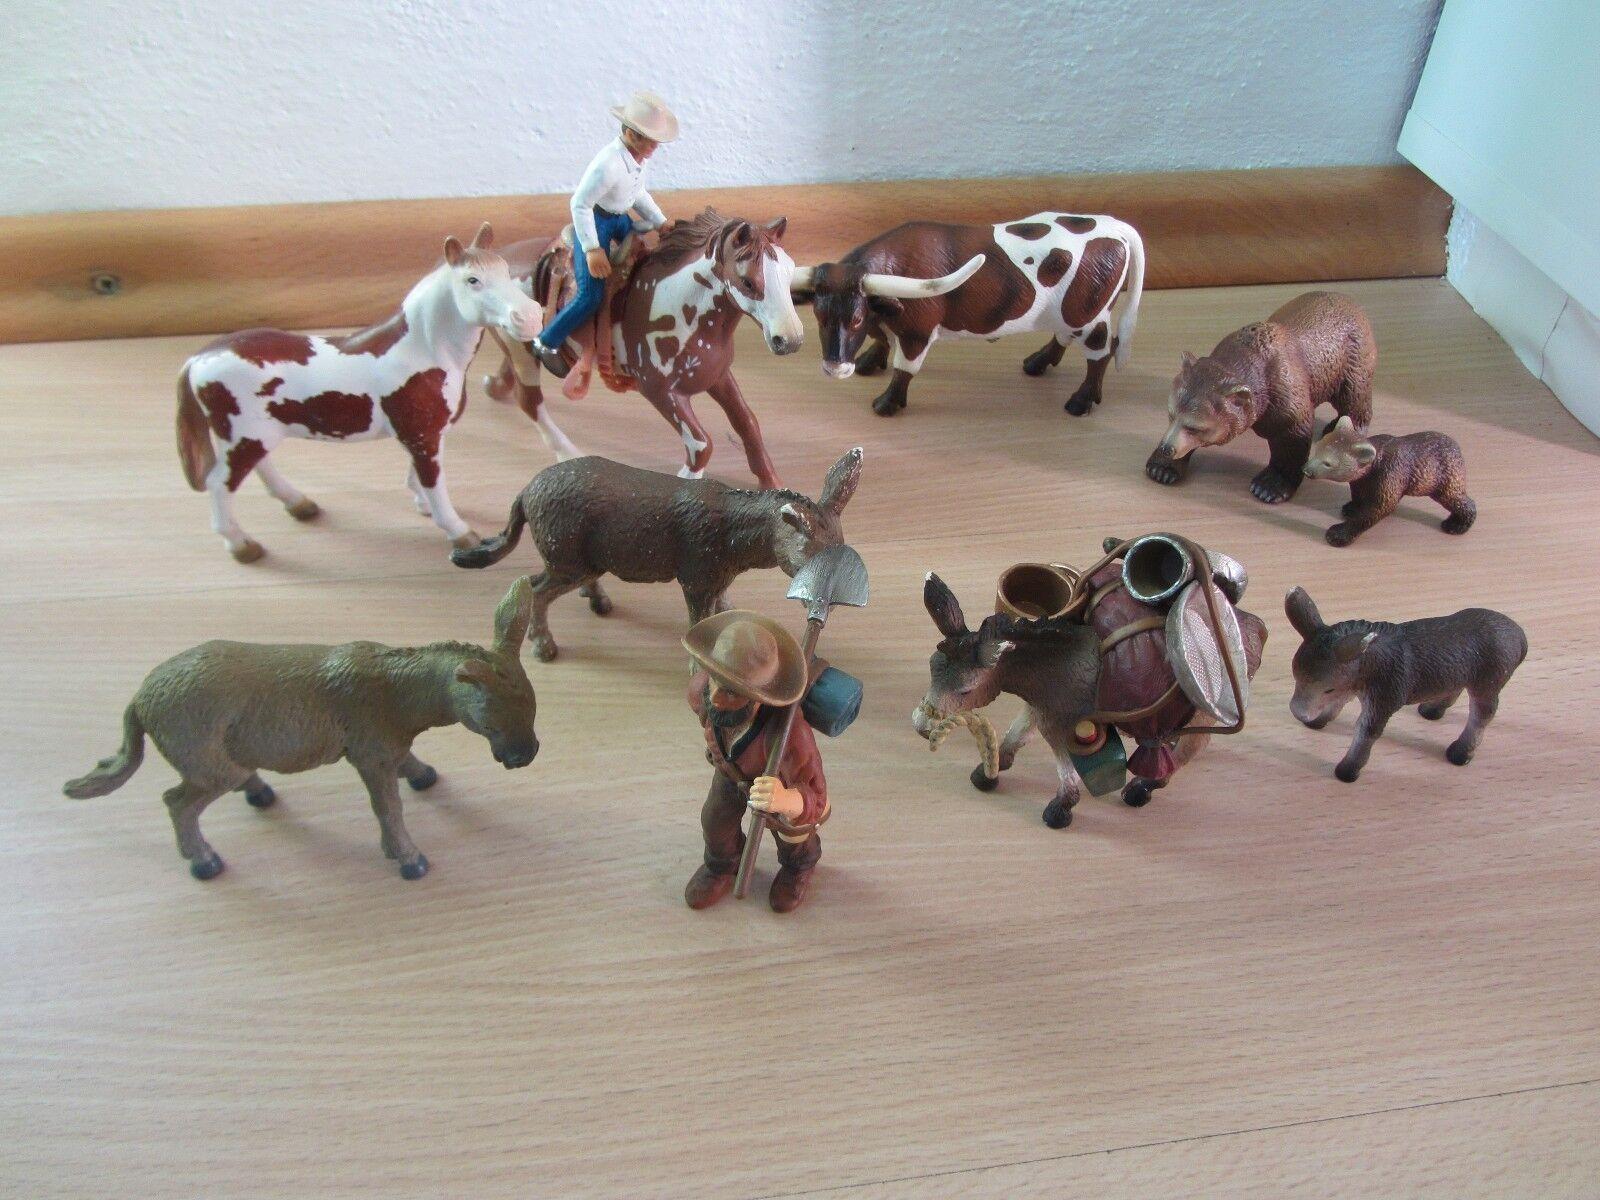 Schleich - Goldgräber + Esel + Cowboy, Pferd Pinto, Texas Longhorn, Bär Grizzly